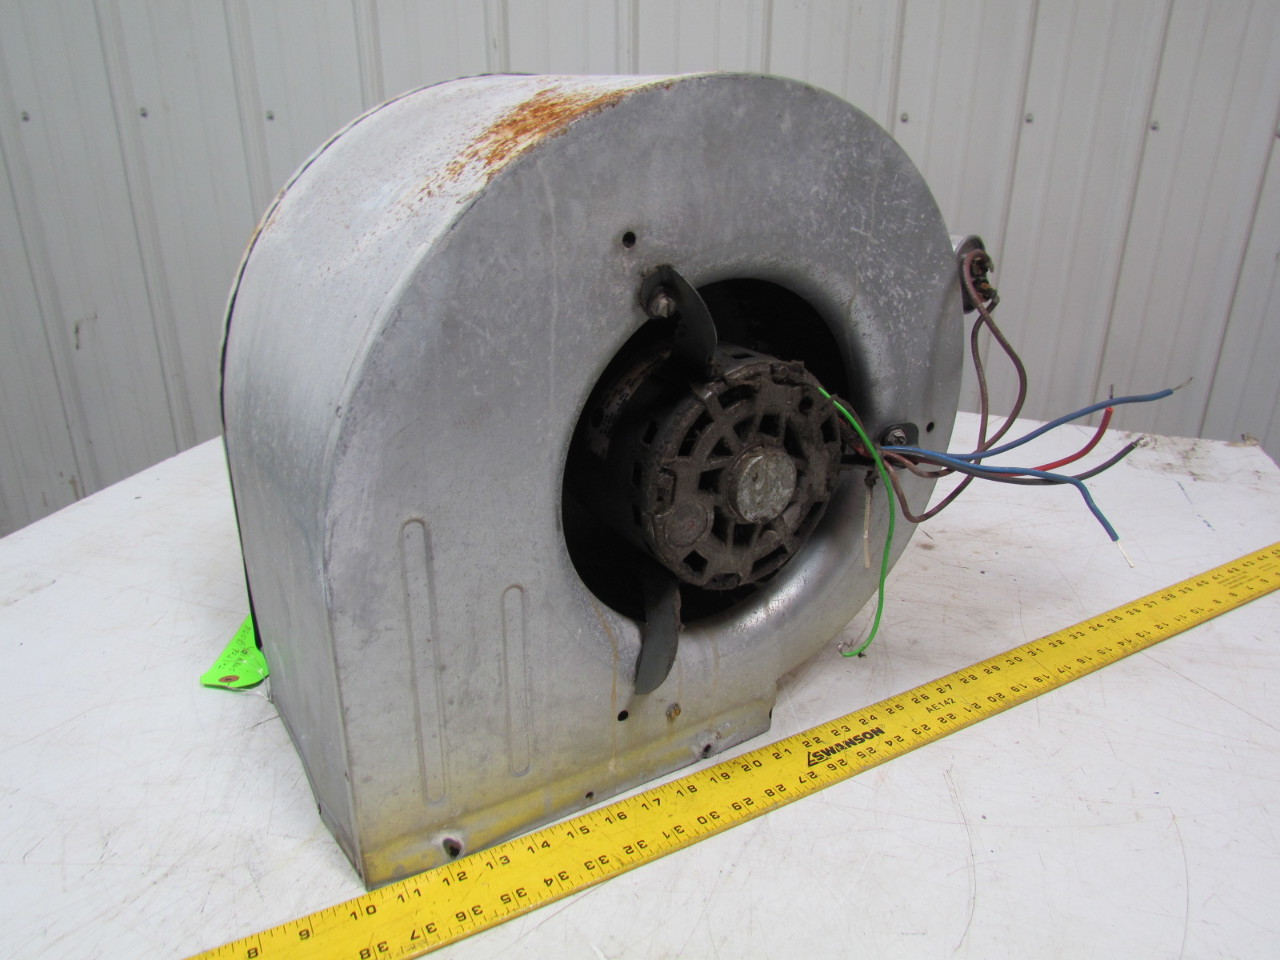 Assembled Furnace Blower 1 2 Hp 115v 1075 Rpm Single Speed